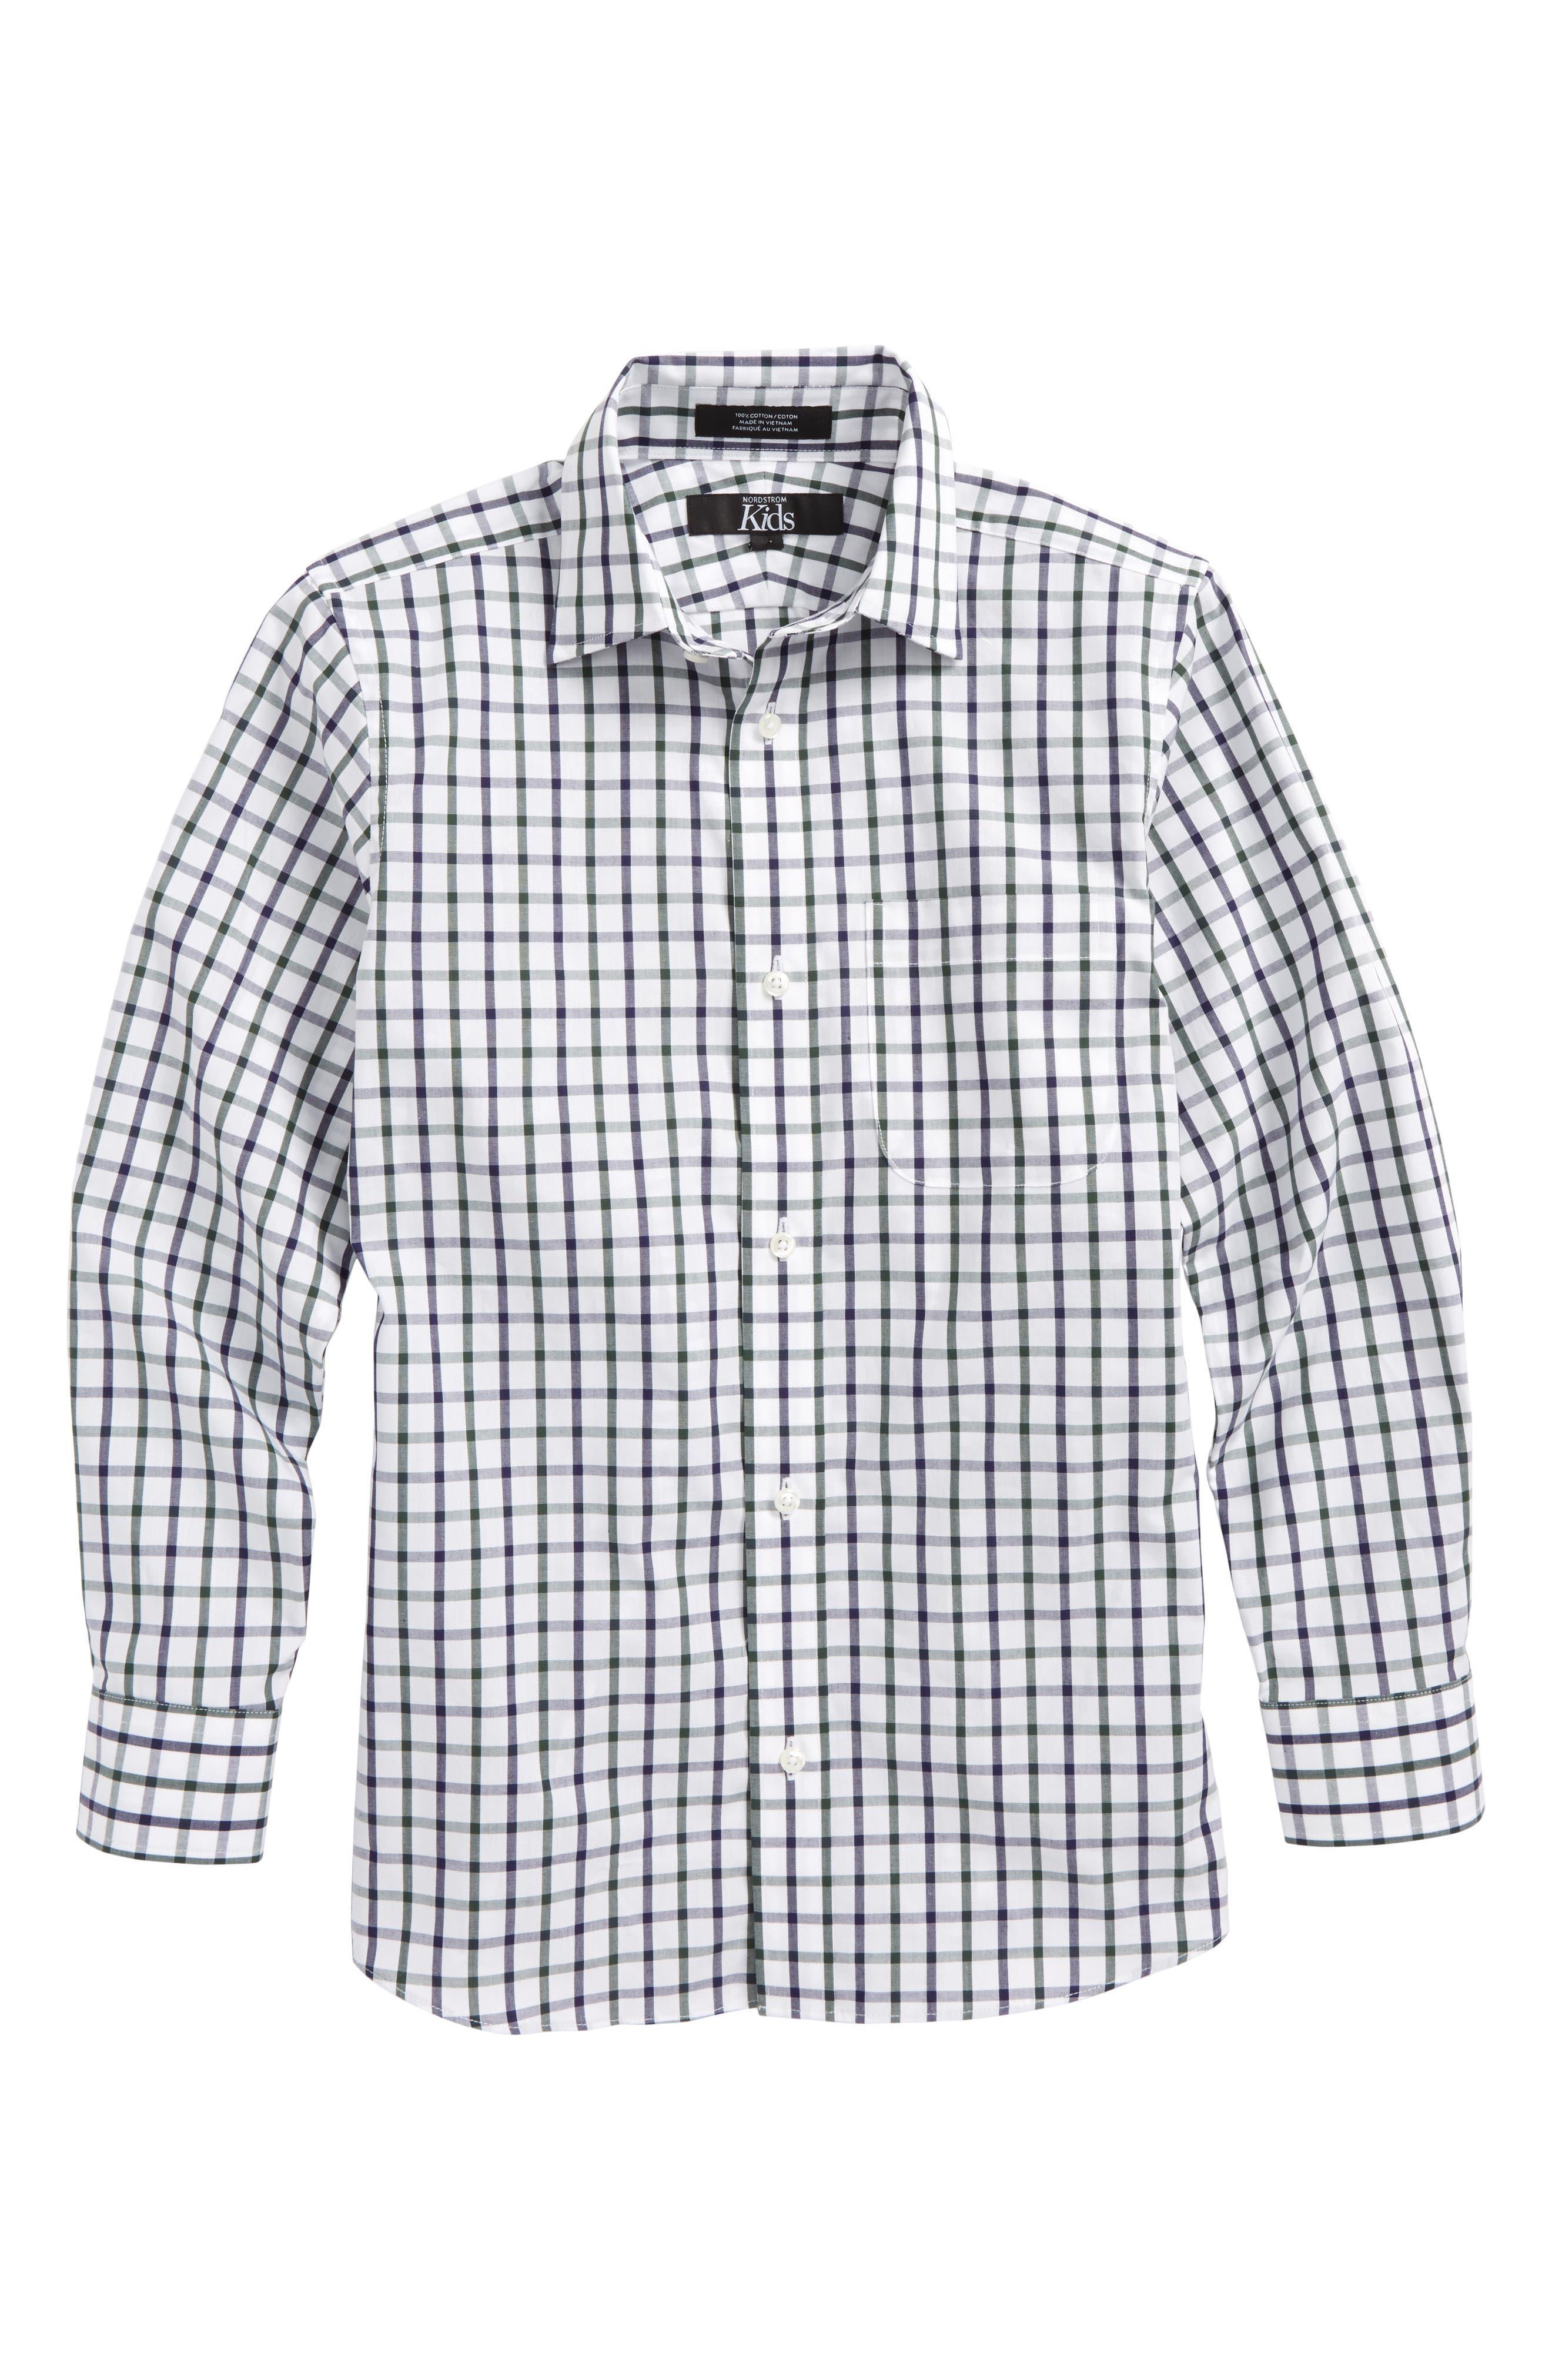 Main Image - Nordstrom Windowpane Plaid Dress Shirt (Little Boys & Big Boys)